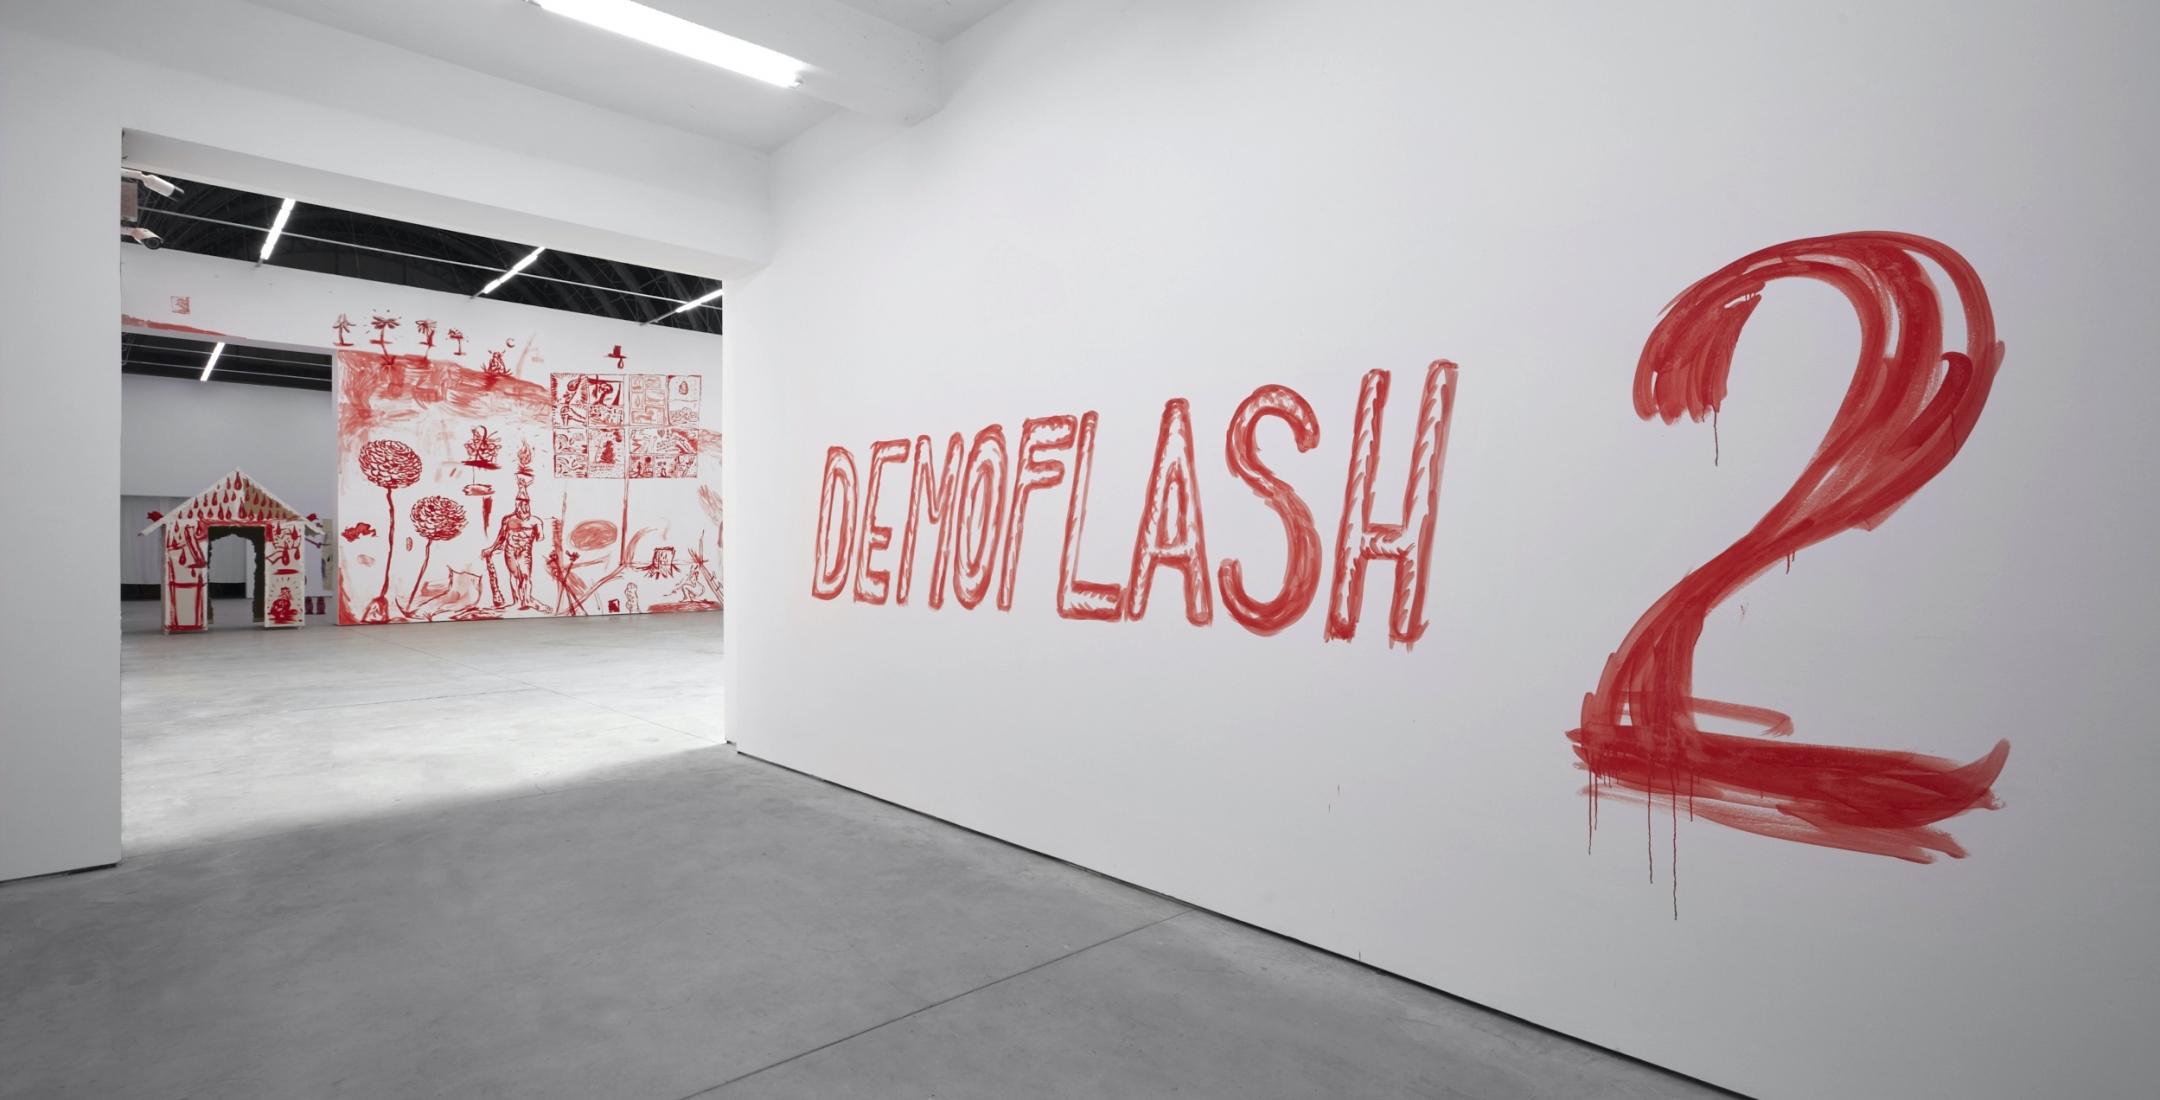 Razvan Boar: DEMOFLASH II